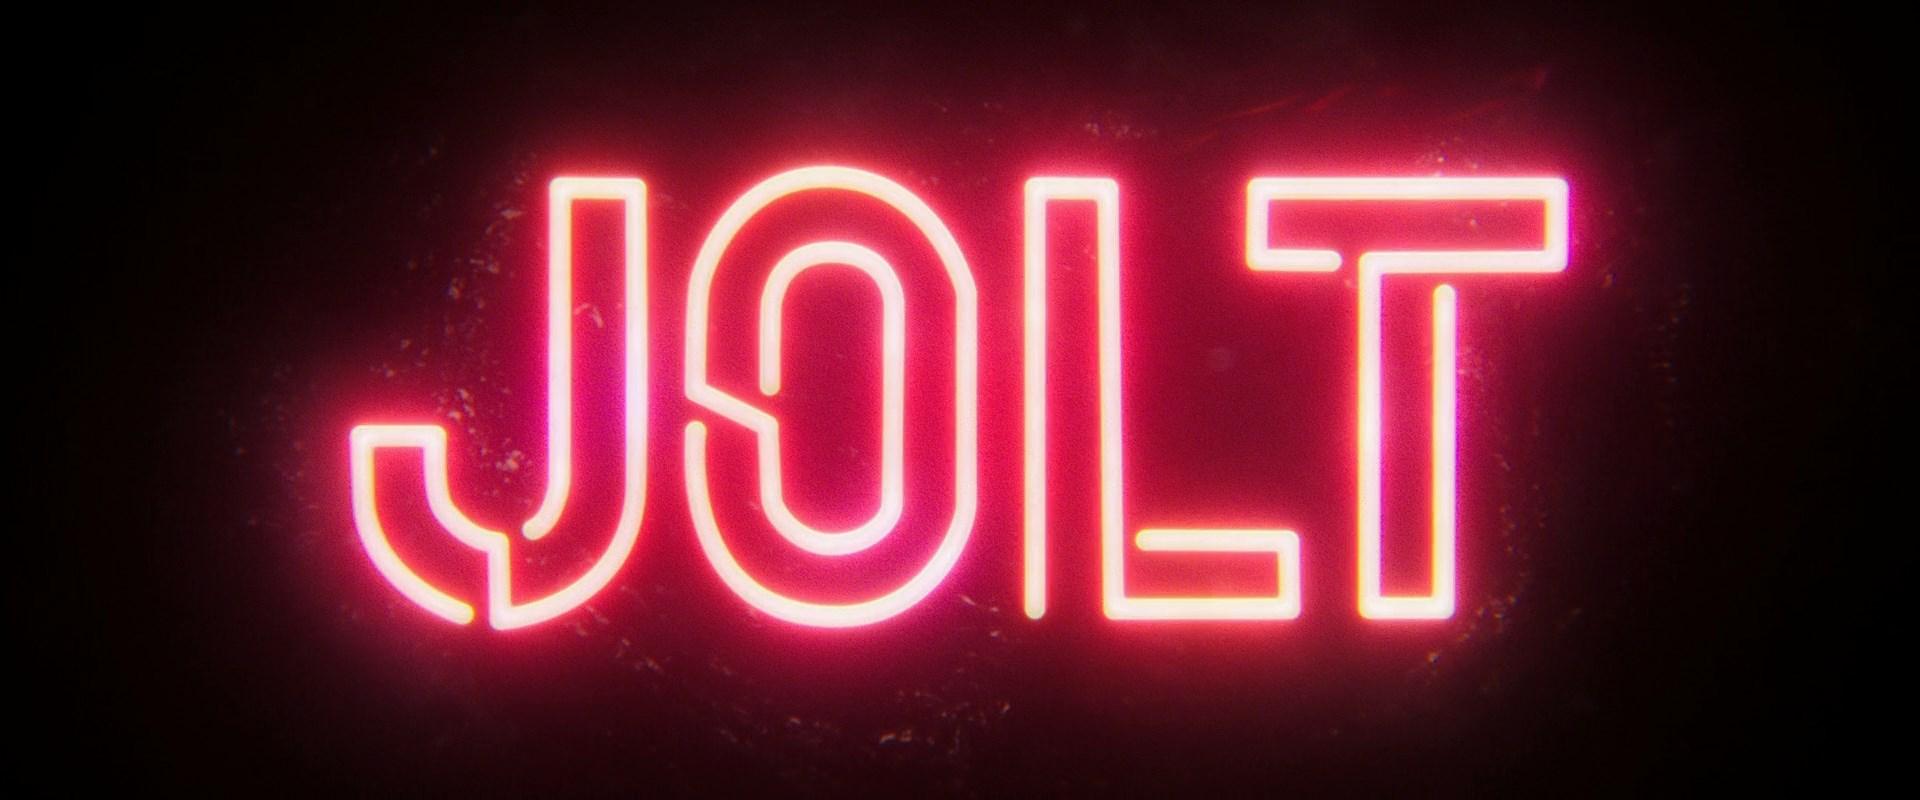 Jolt (2021) 1080p WEB-DL AMZN Latino